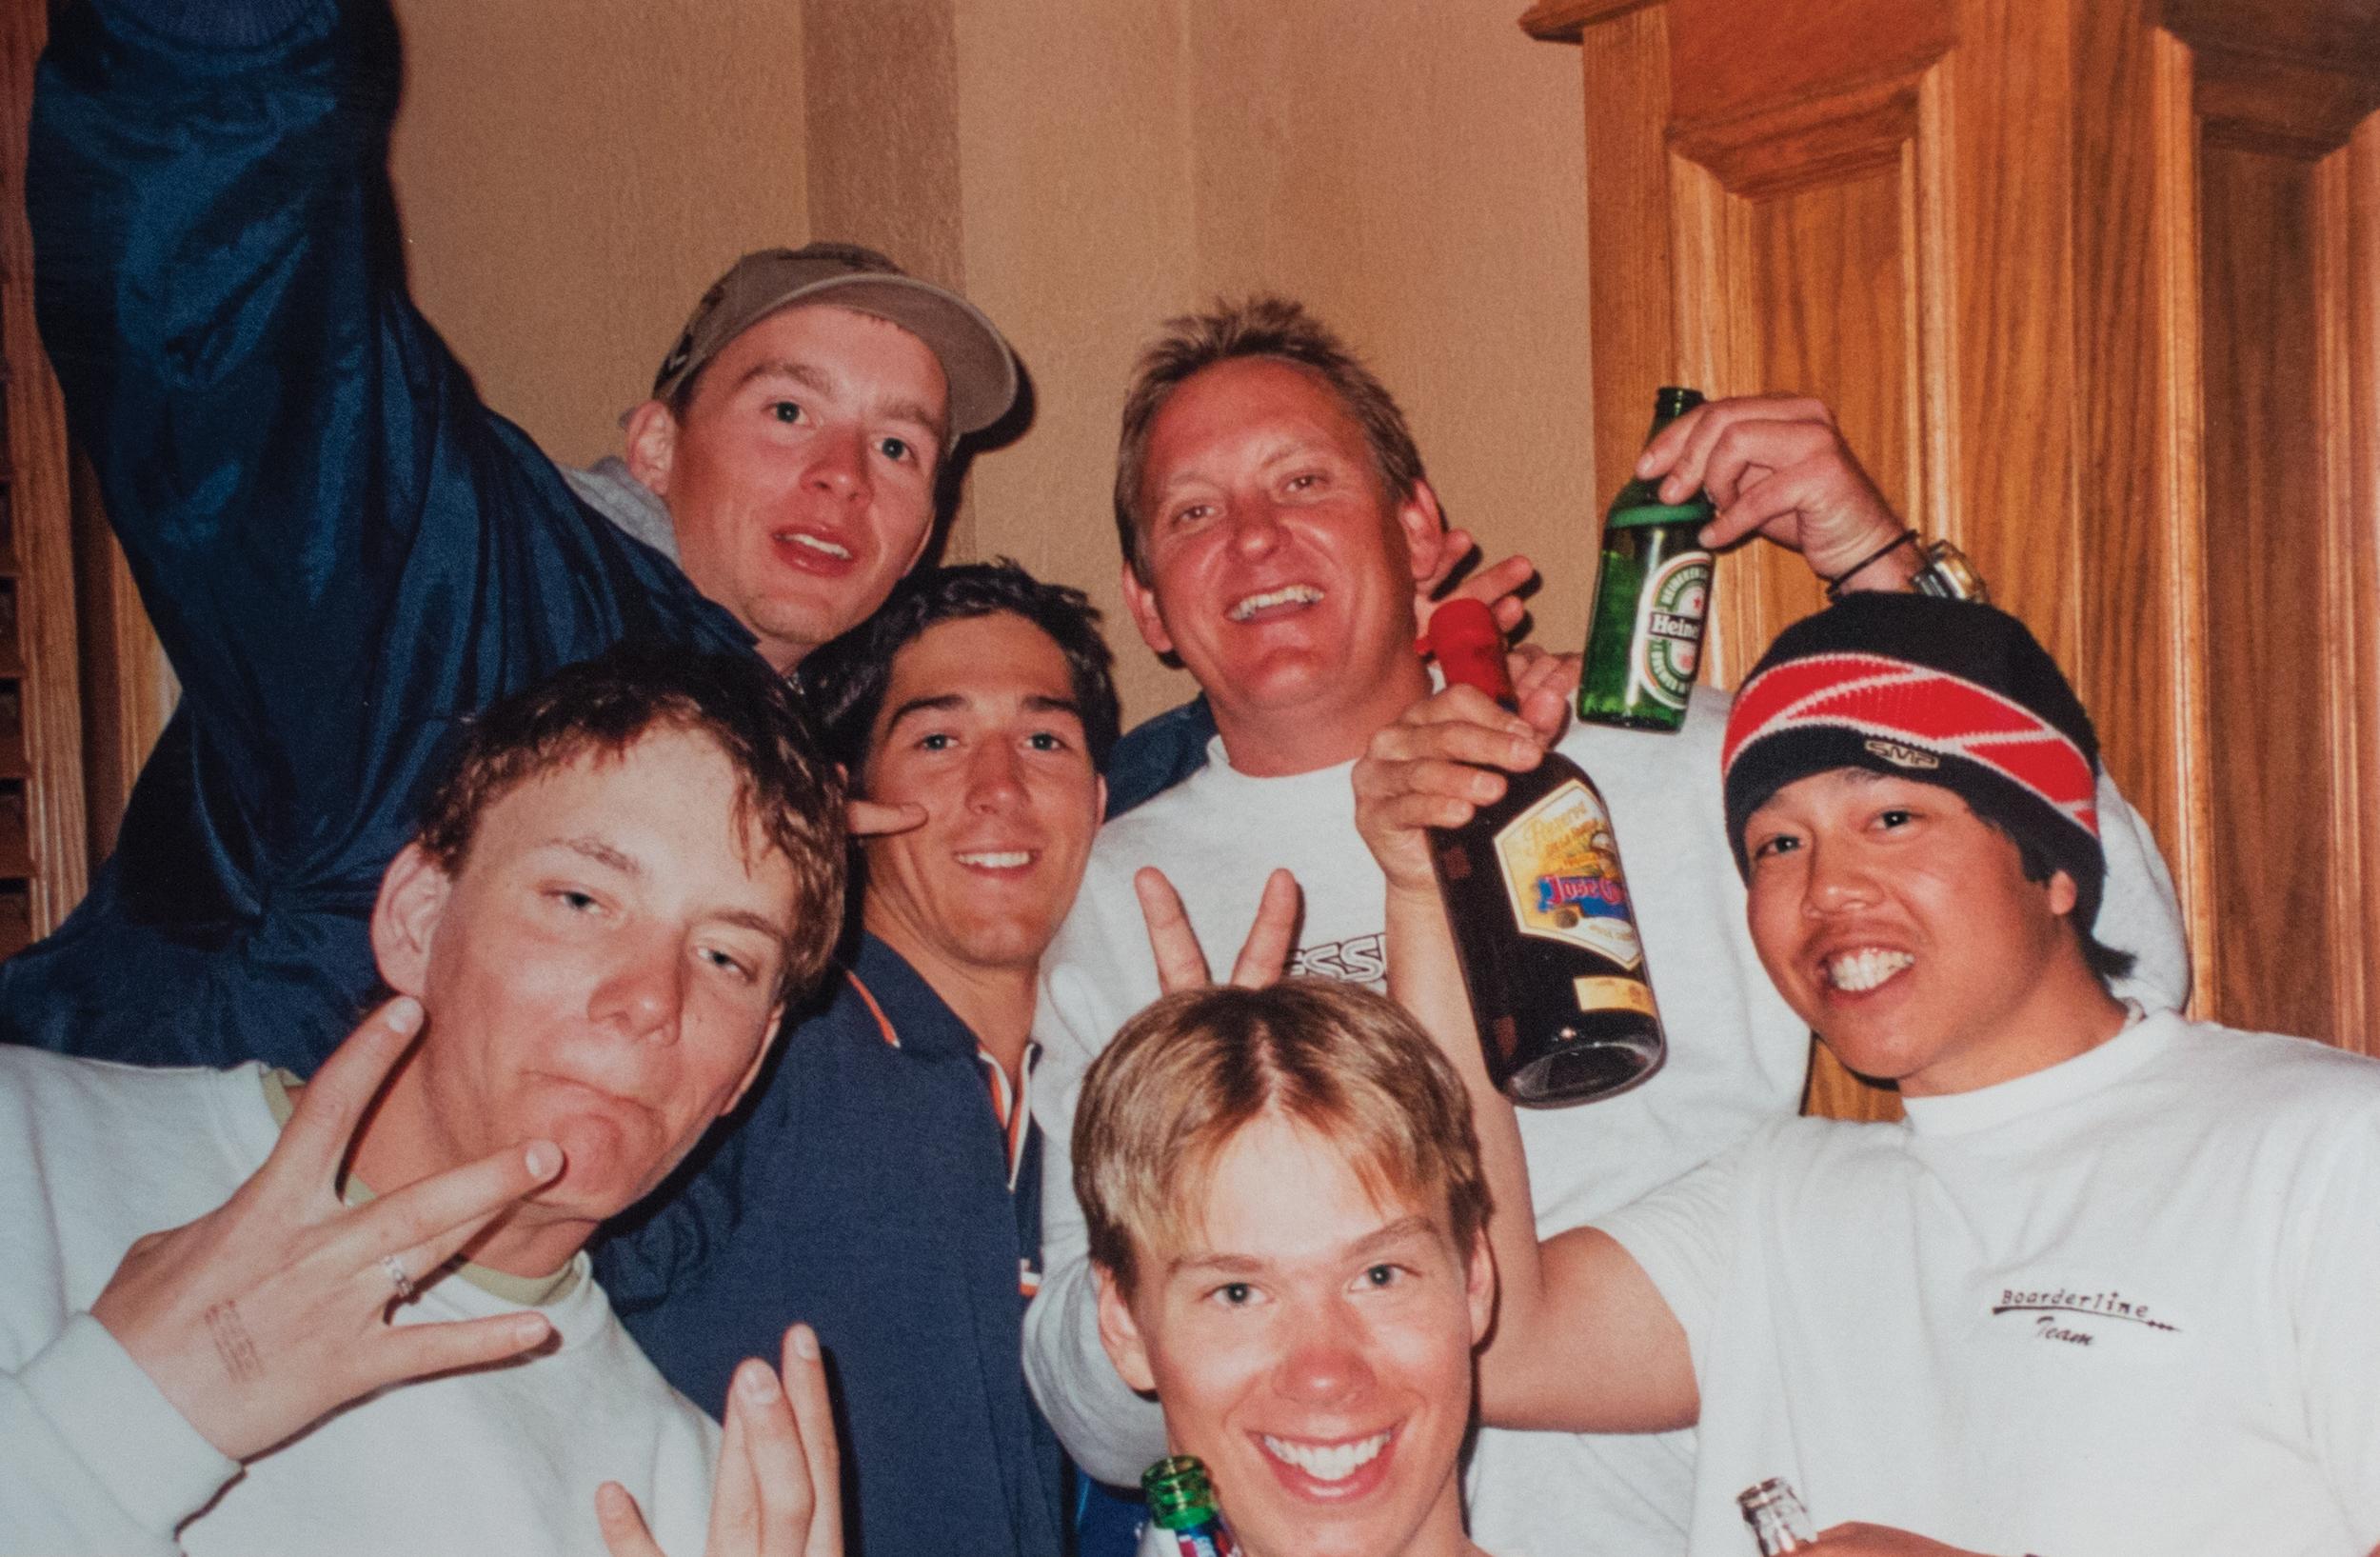 Ryan Collard, Mark Landvik, Bubba Weedman, Jake Liska, Dave Fermin.jpg